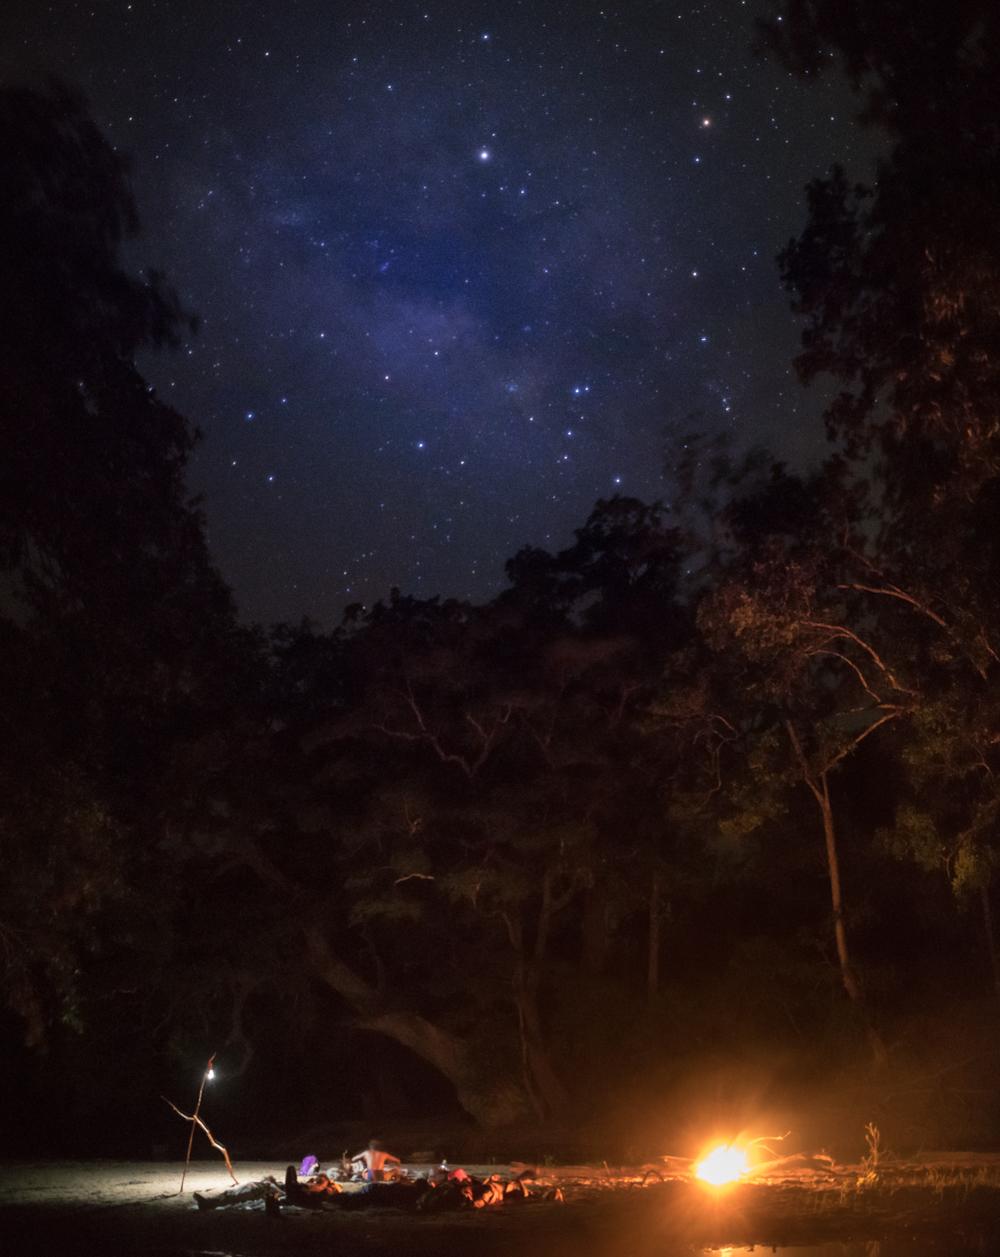 Milky Way - Pada Yatra